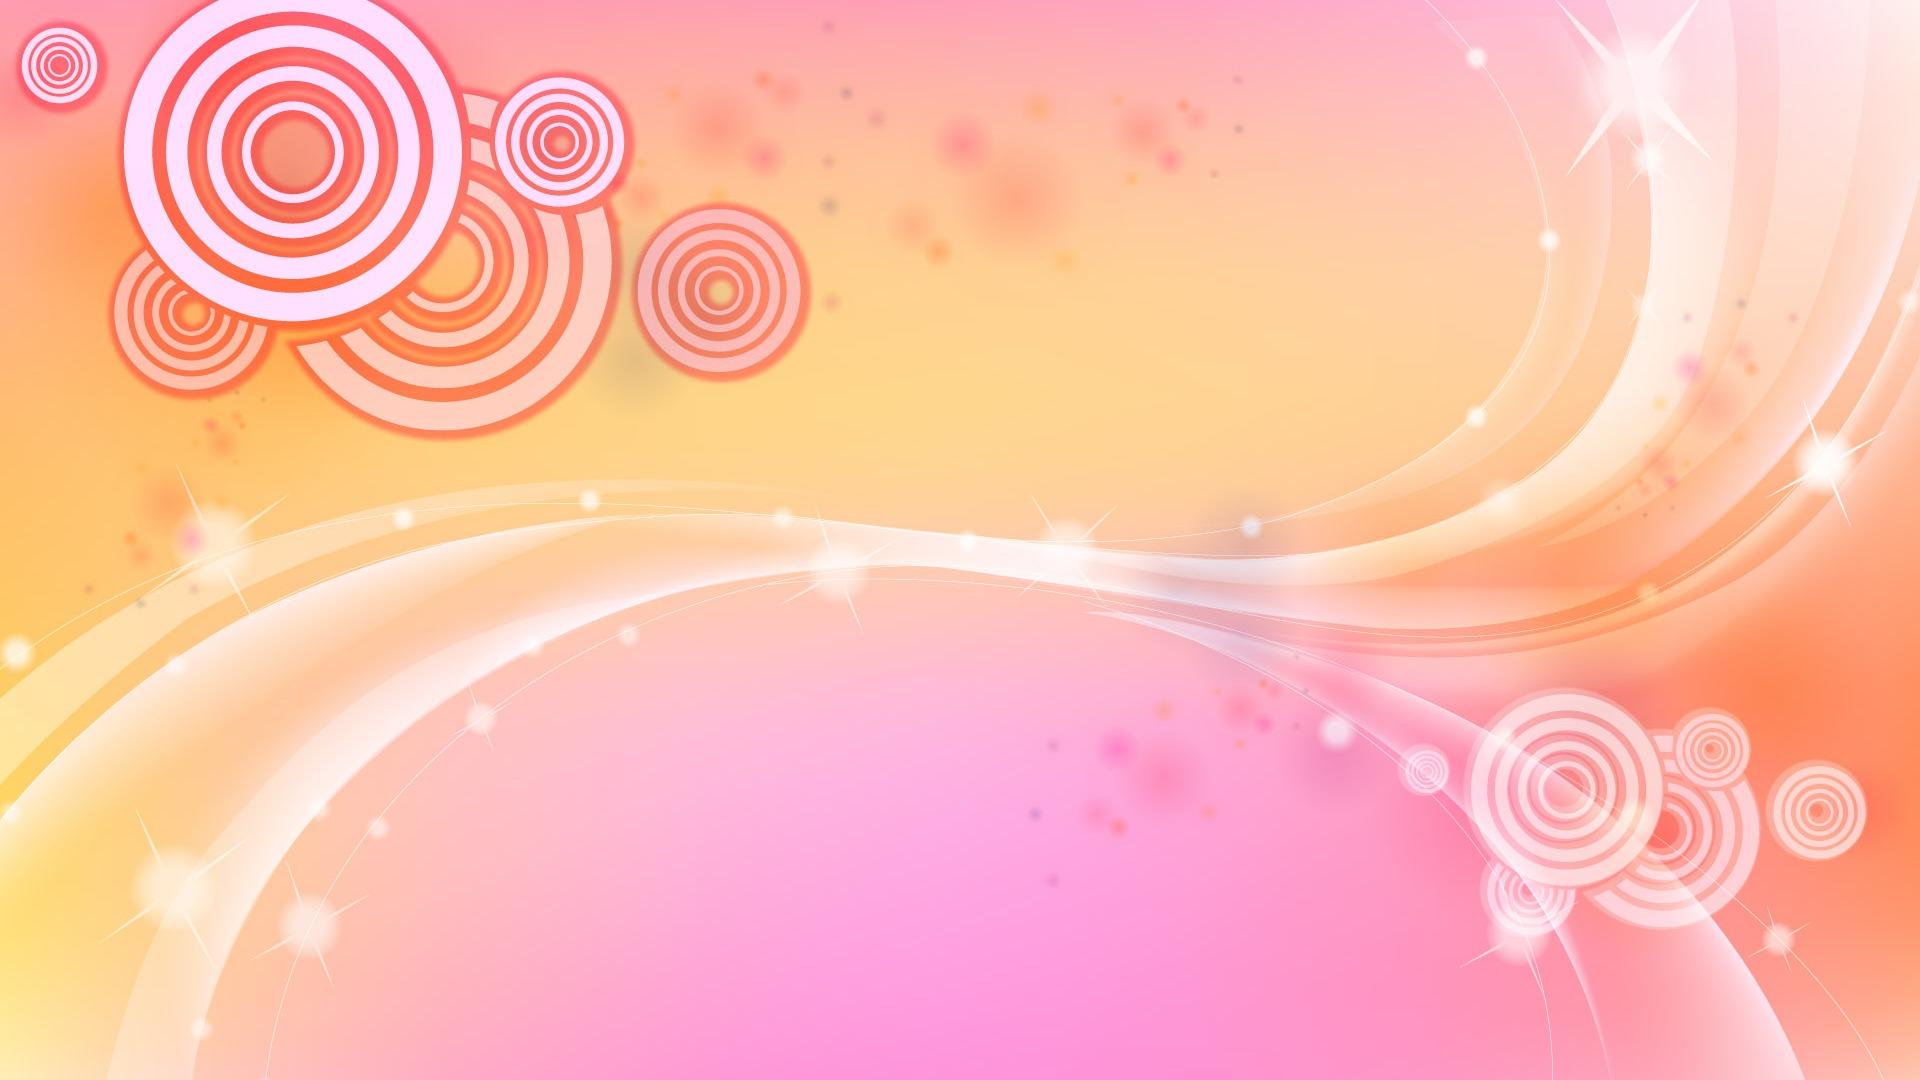 wallpaper designs design vector blogger 1920x1080